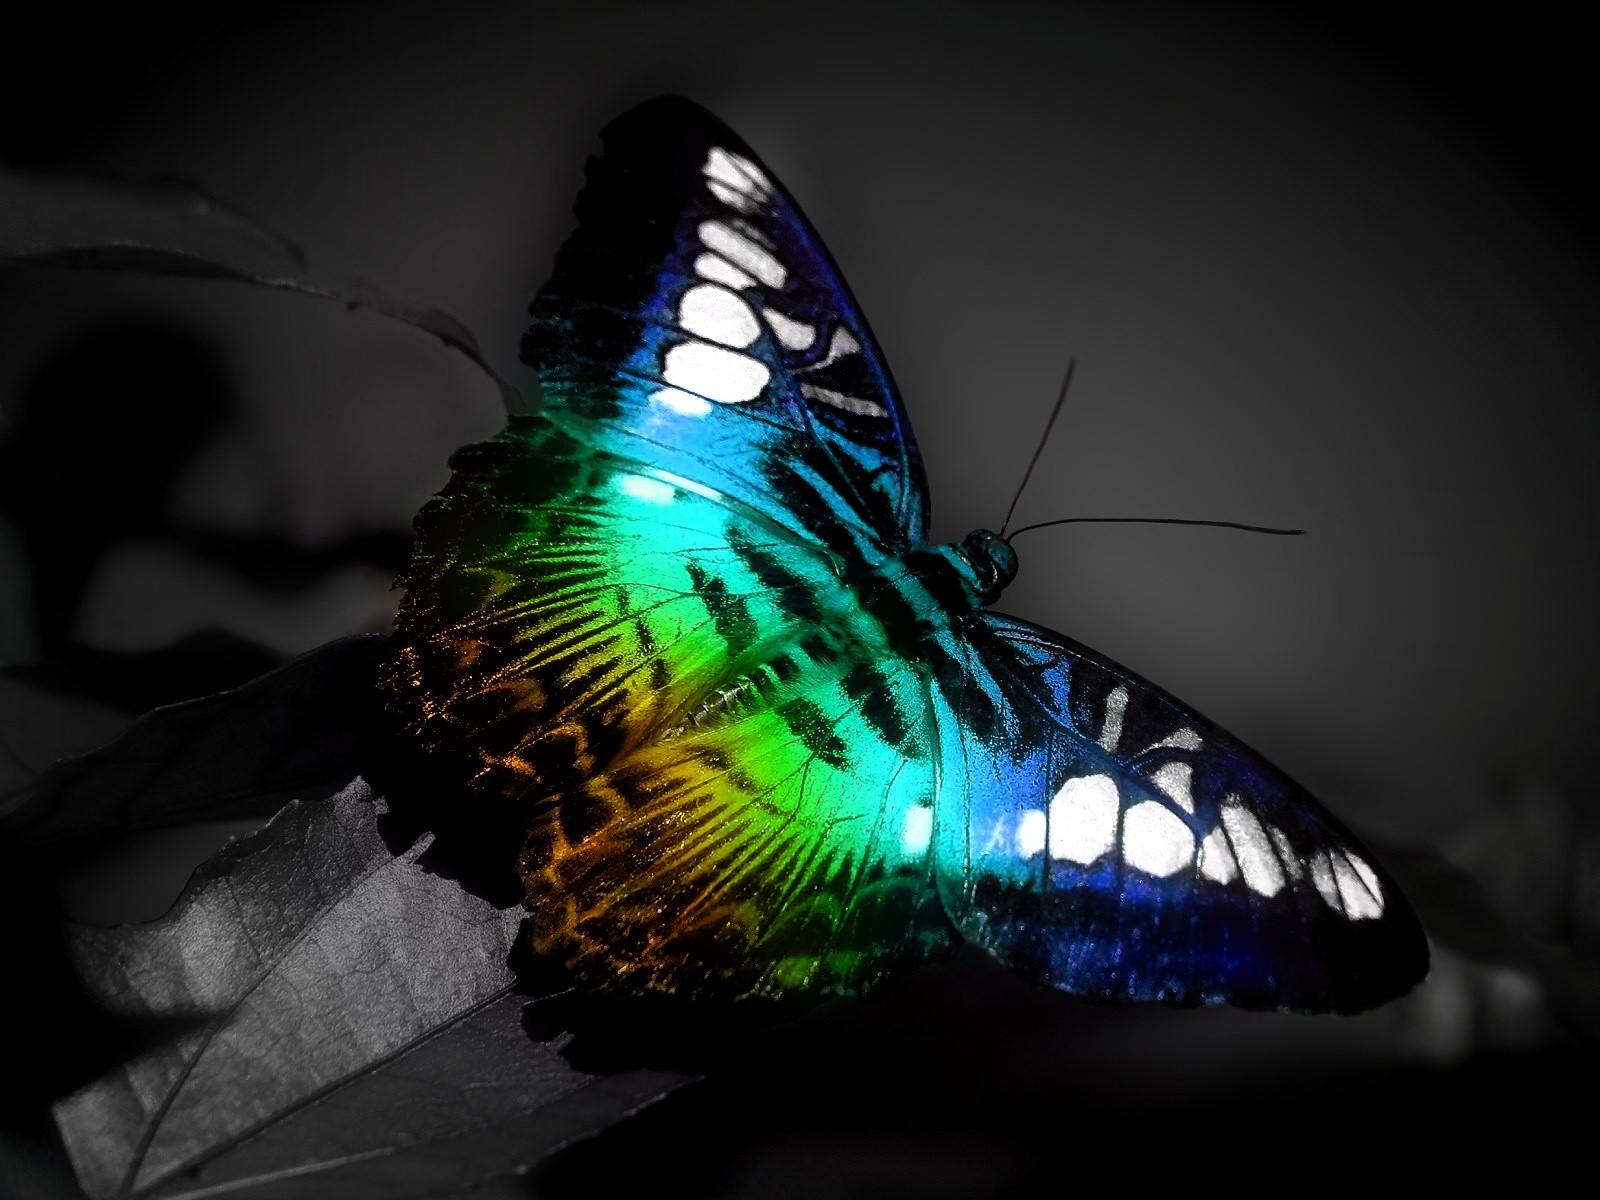 https://2.bp.blogspot.com/-HVhq2L3JnH0/TcrgudlgpVI/AAAAAAAACak/wqIJHgfsVc8/s1600/butterfly-wallpapers_6645_1600x1200.jpg